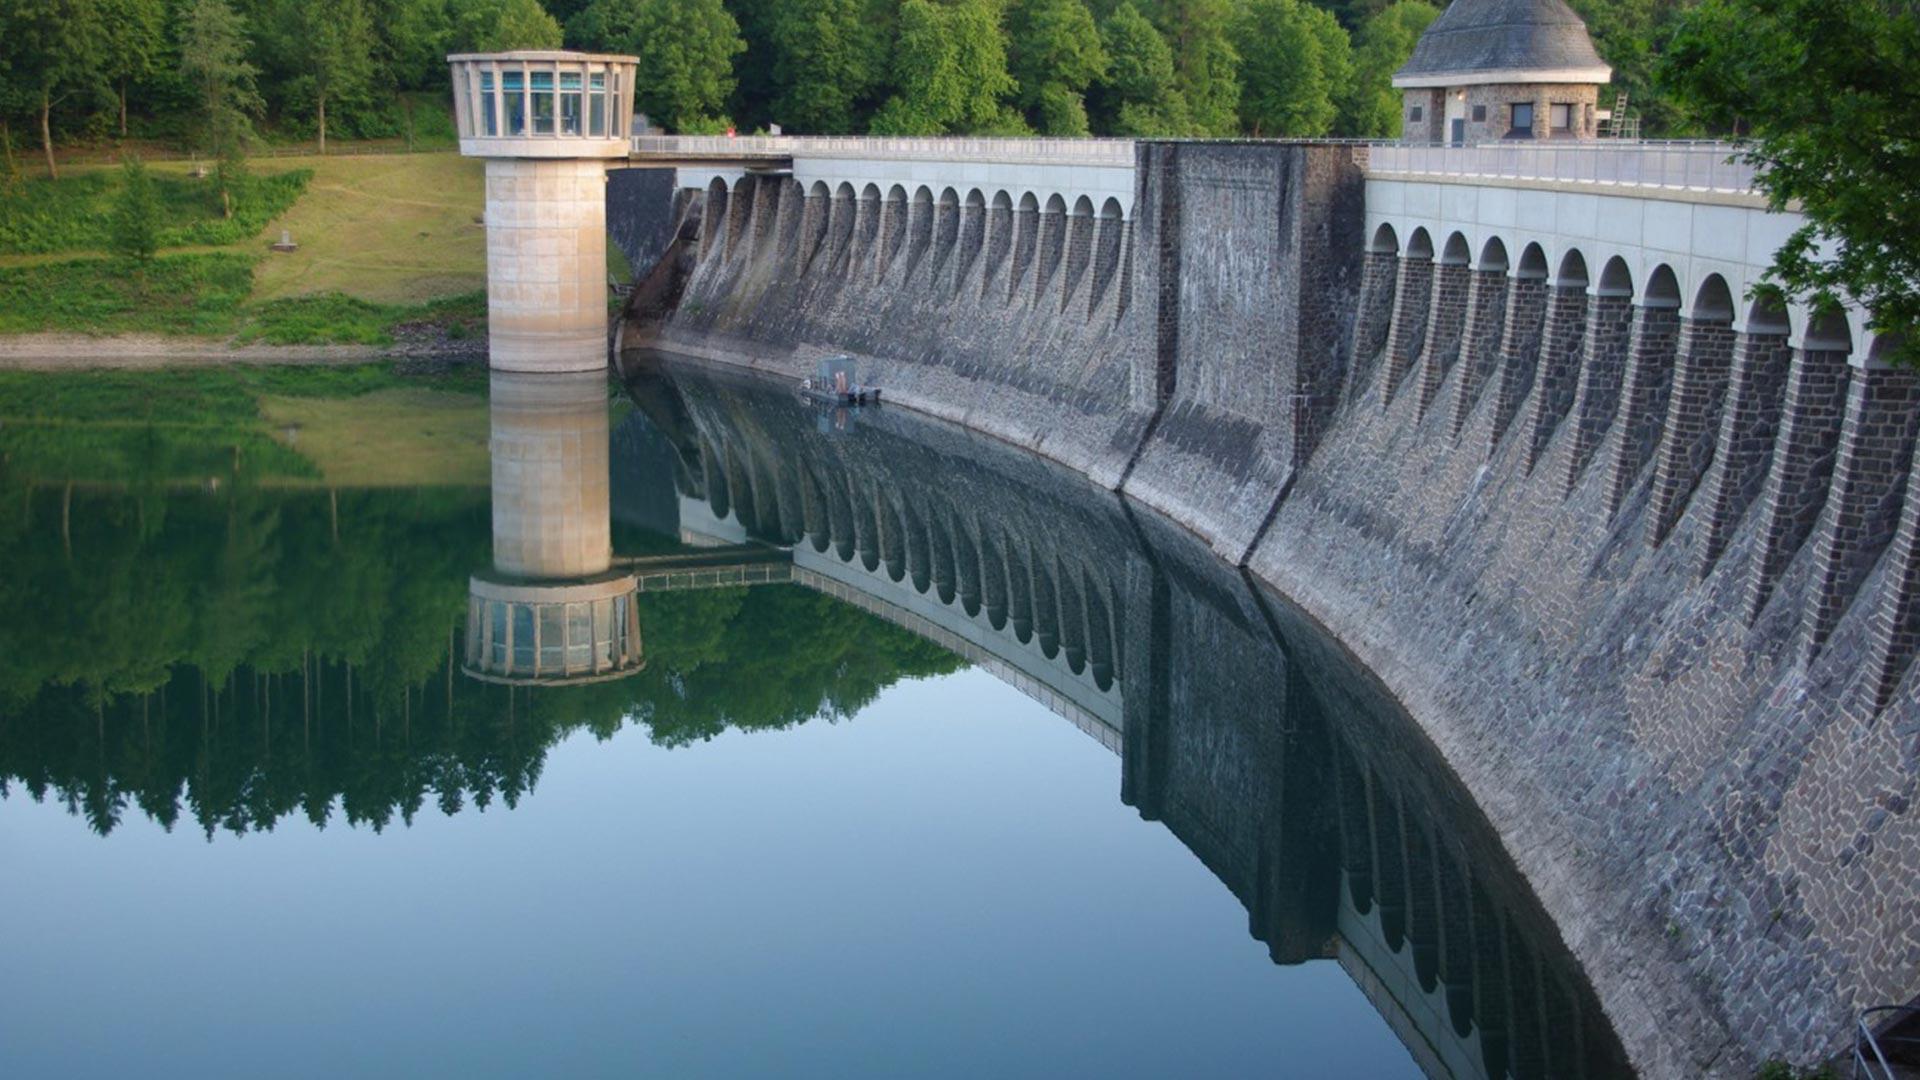 Maintenance of a little dam and new area development Siegen Germany.